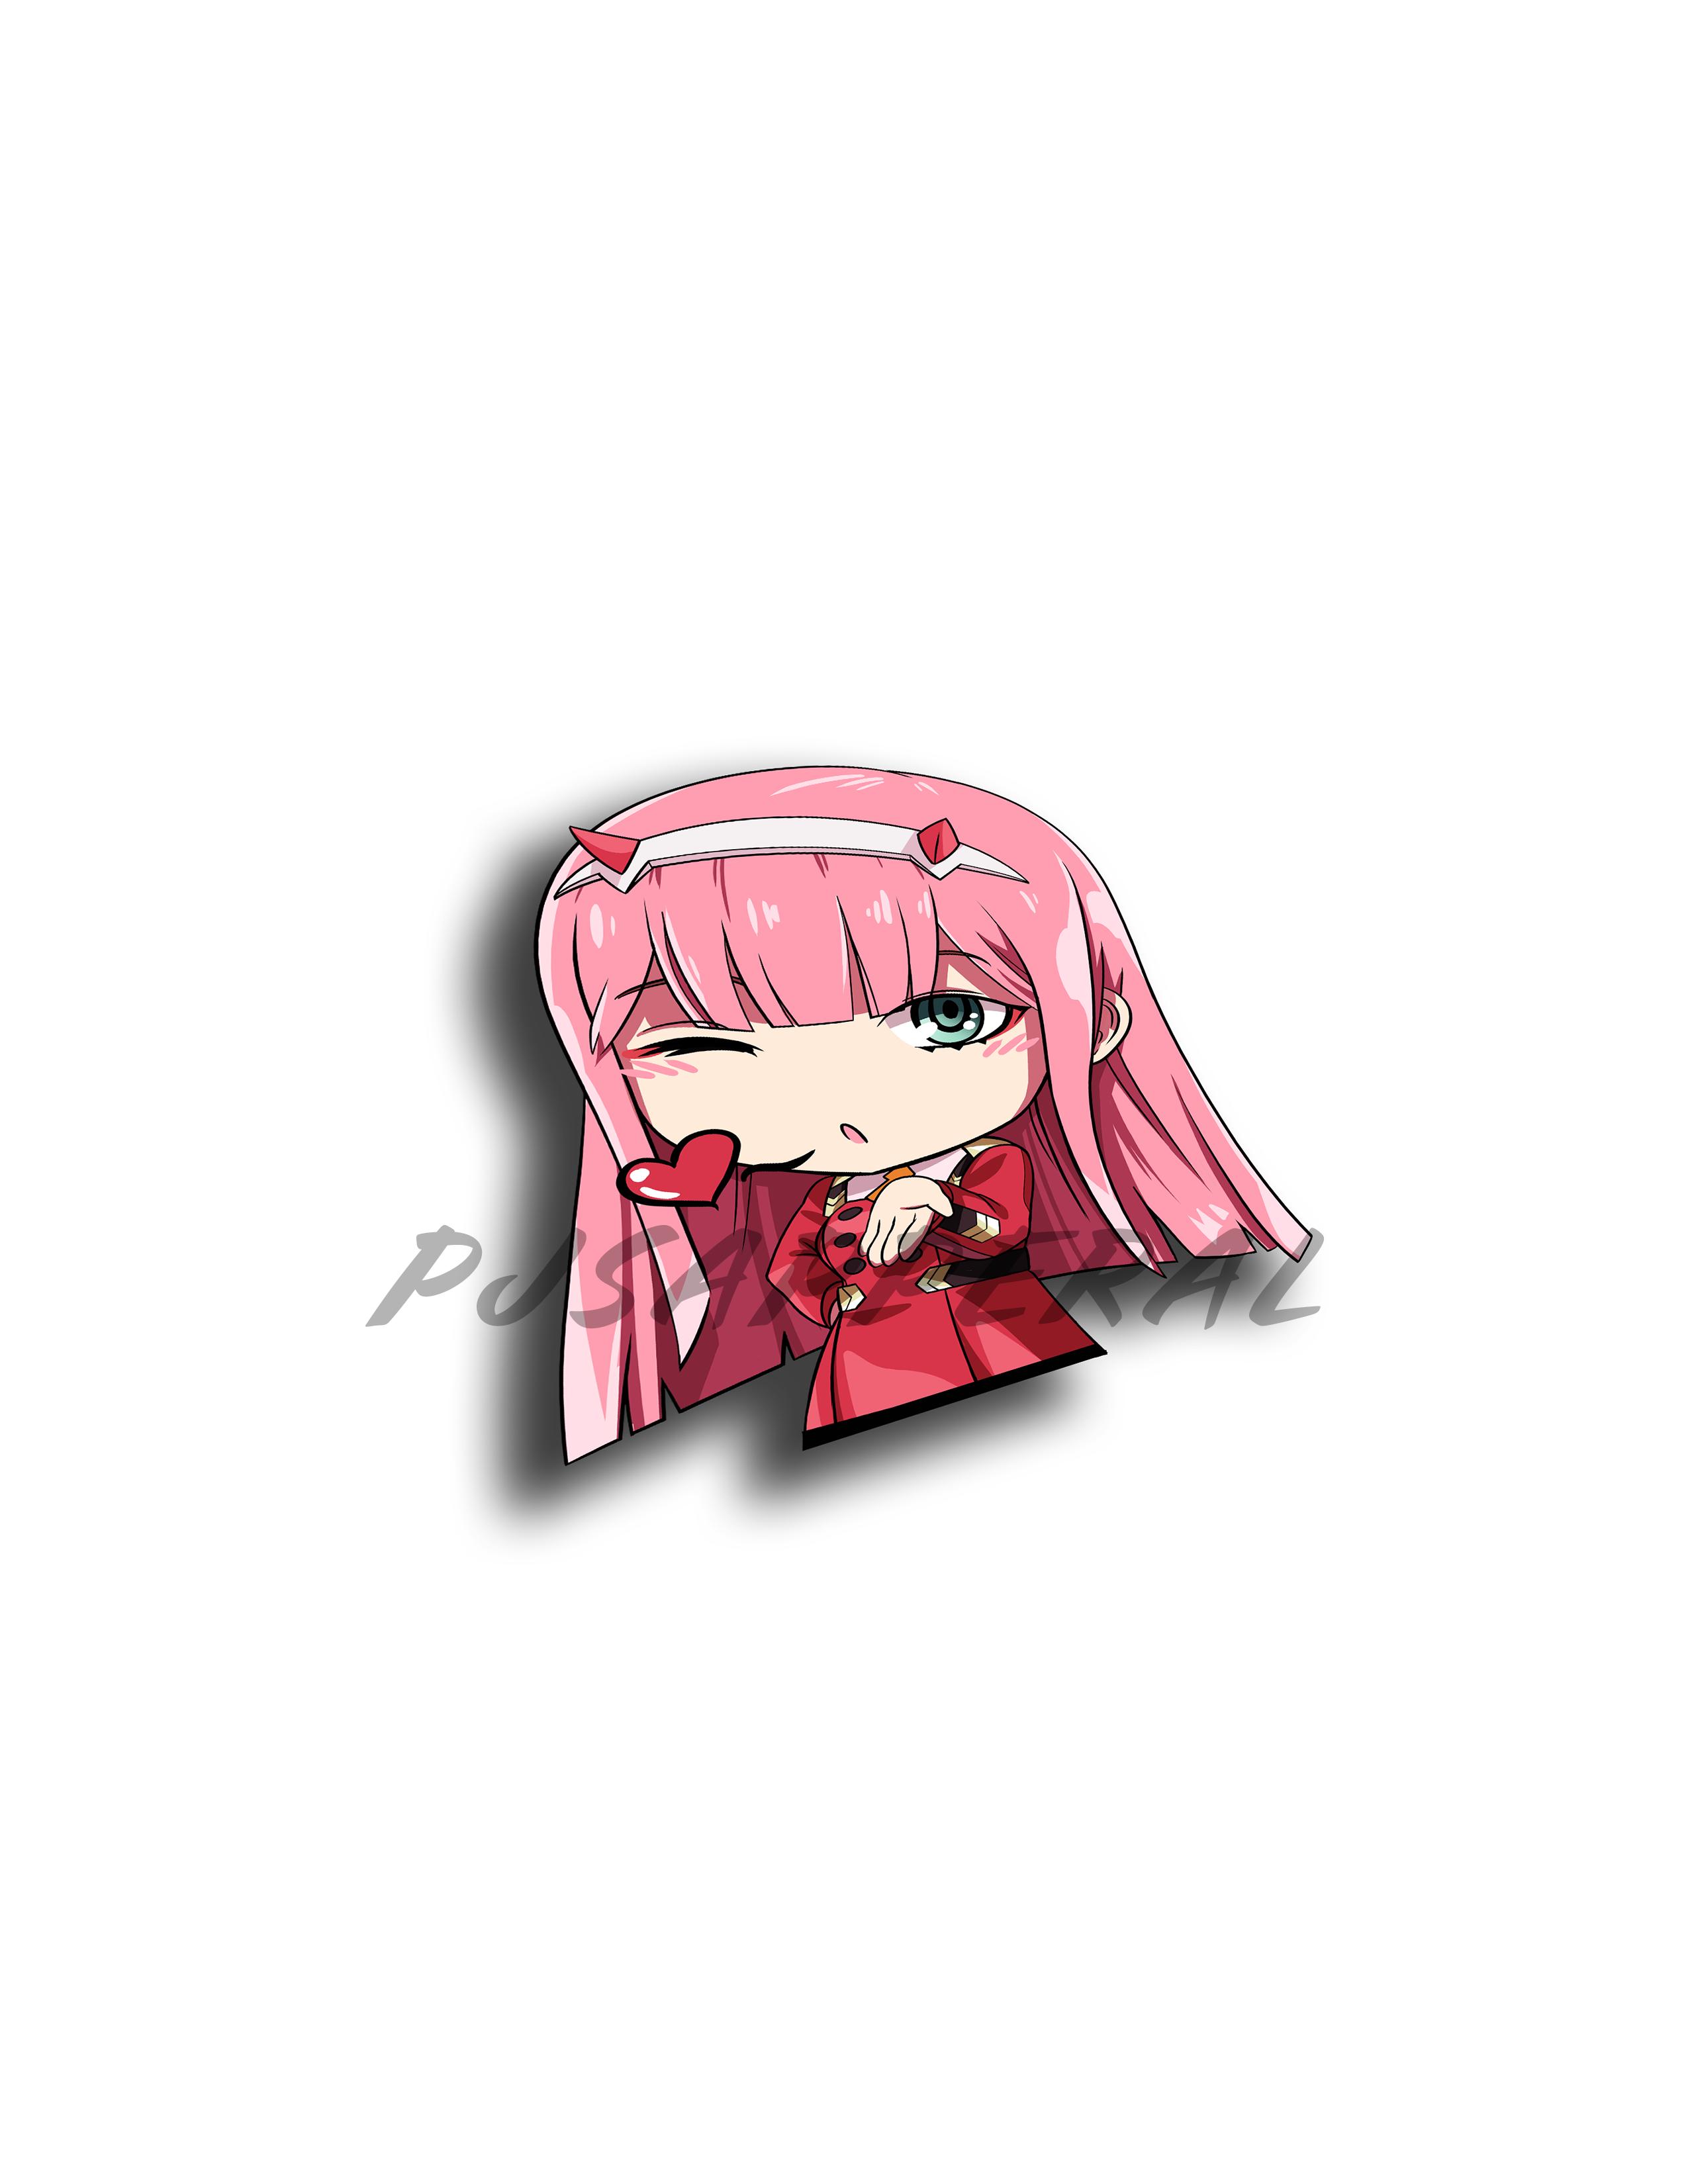 02 Chibi Sticker Decal Anime Decals Chibi Anime